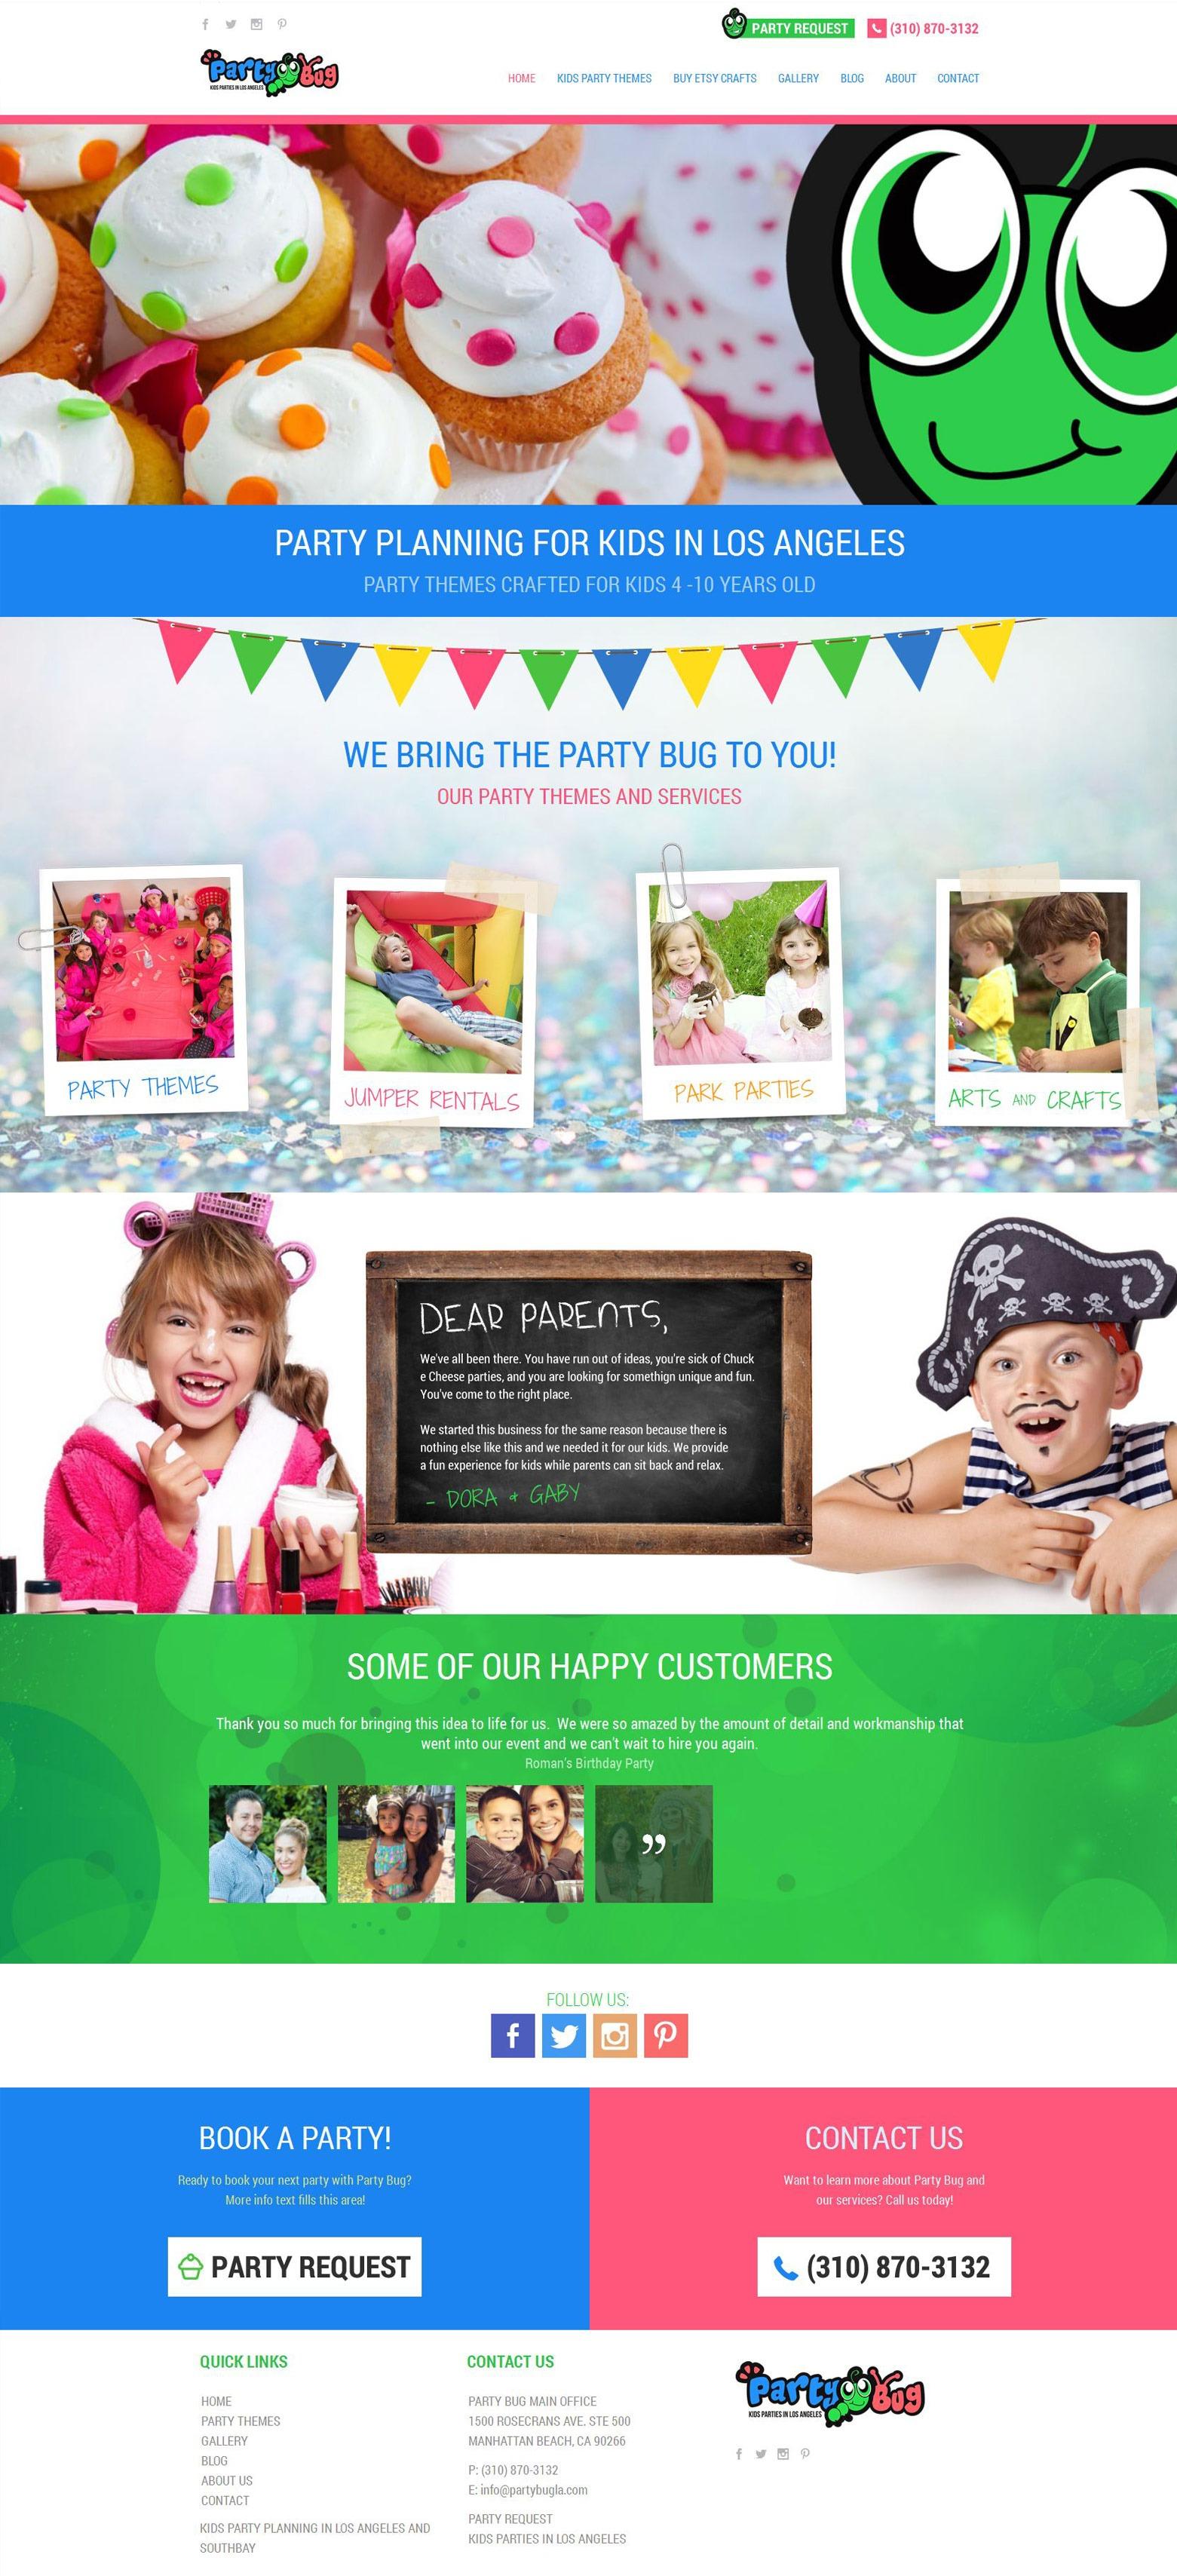 LA Angeles Party Planning Web Design Company